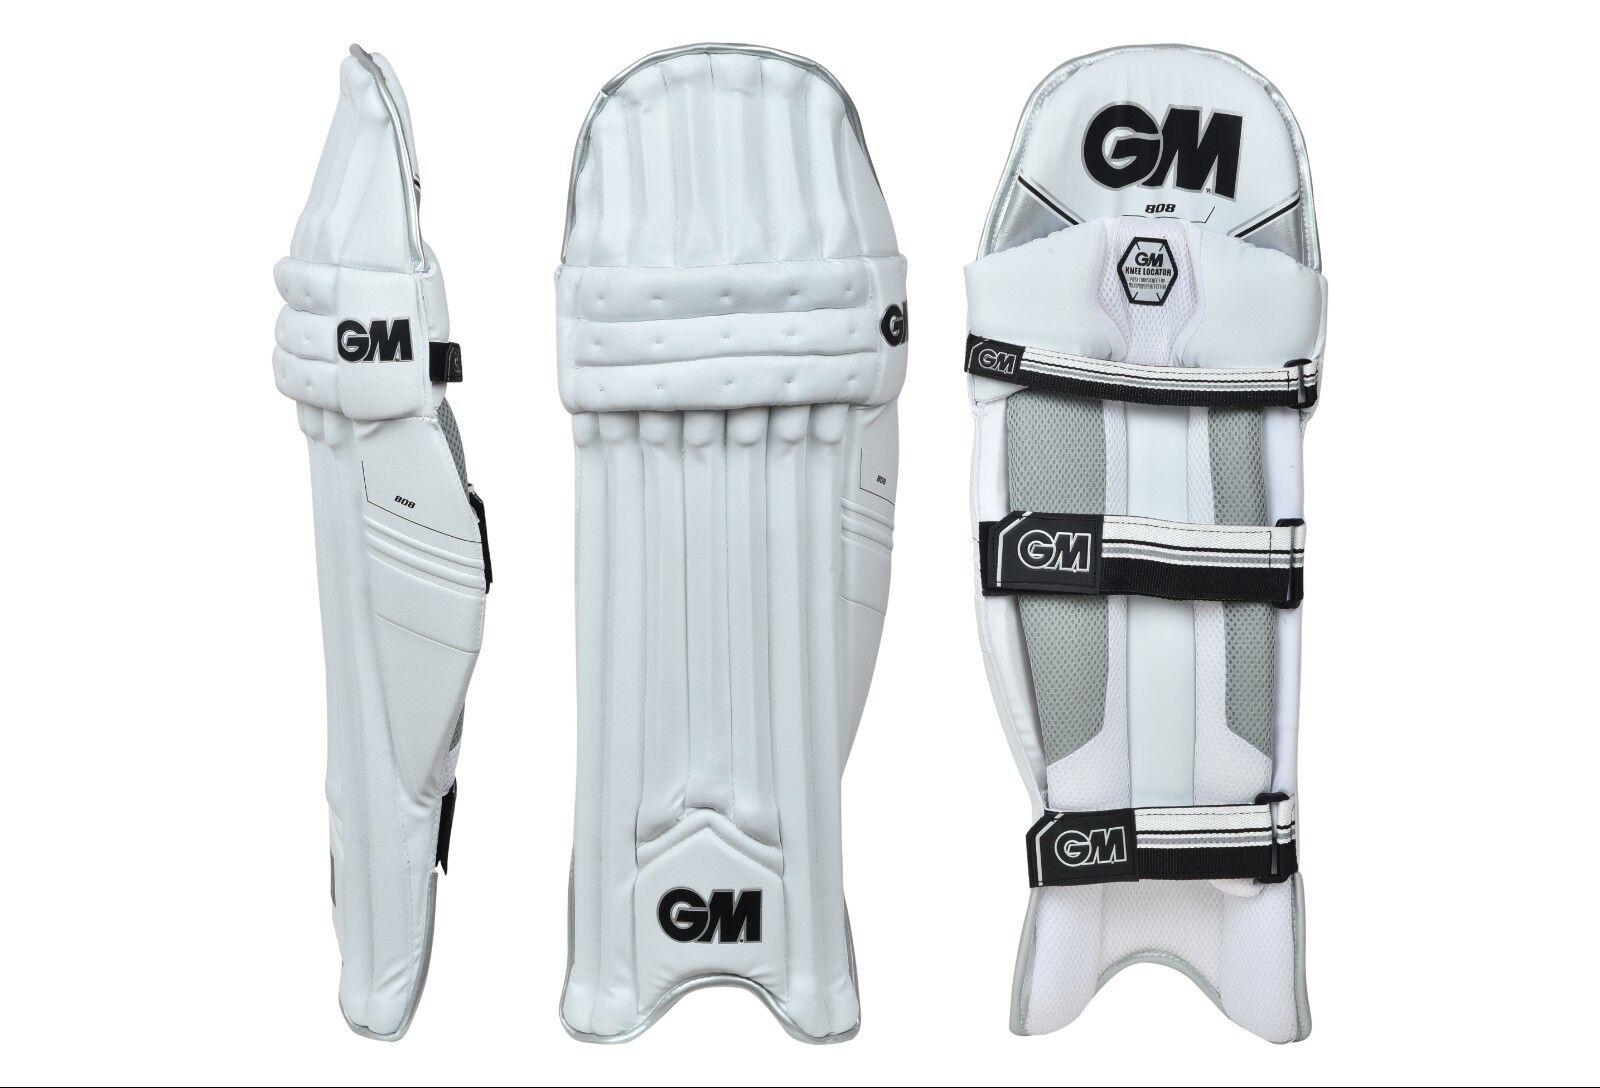 GM 808 Cricket Batting Pad (Leg Guard) RH LH AU Stock Gratis Ship (Cotton Inner)